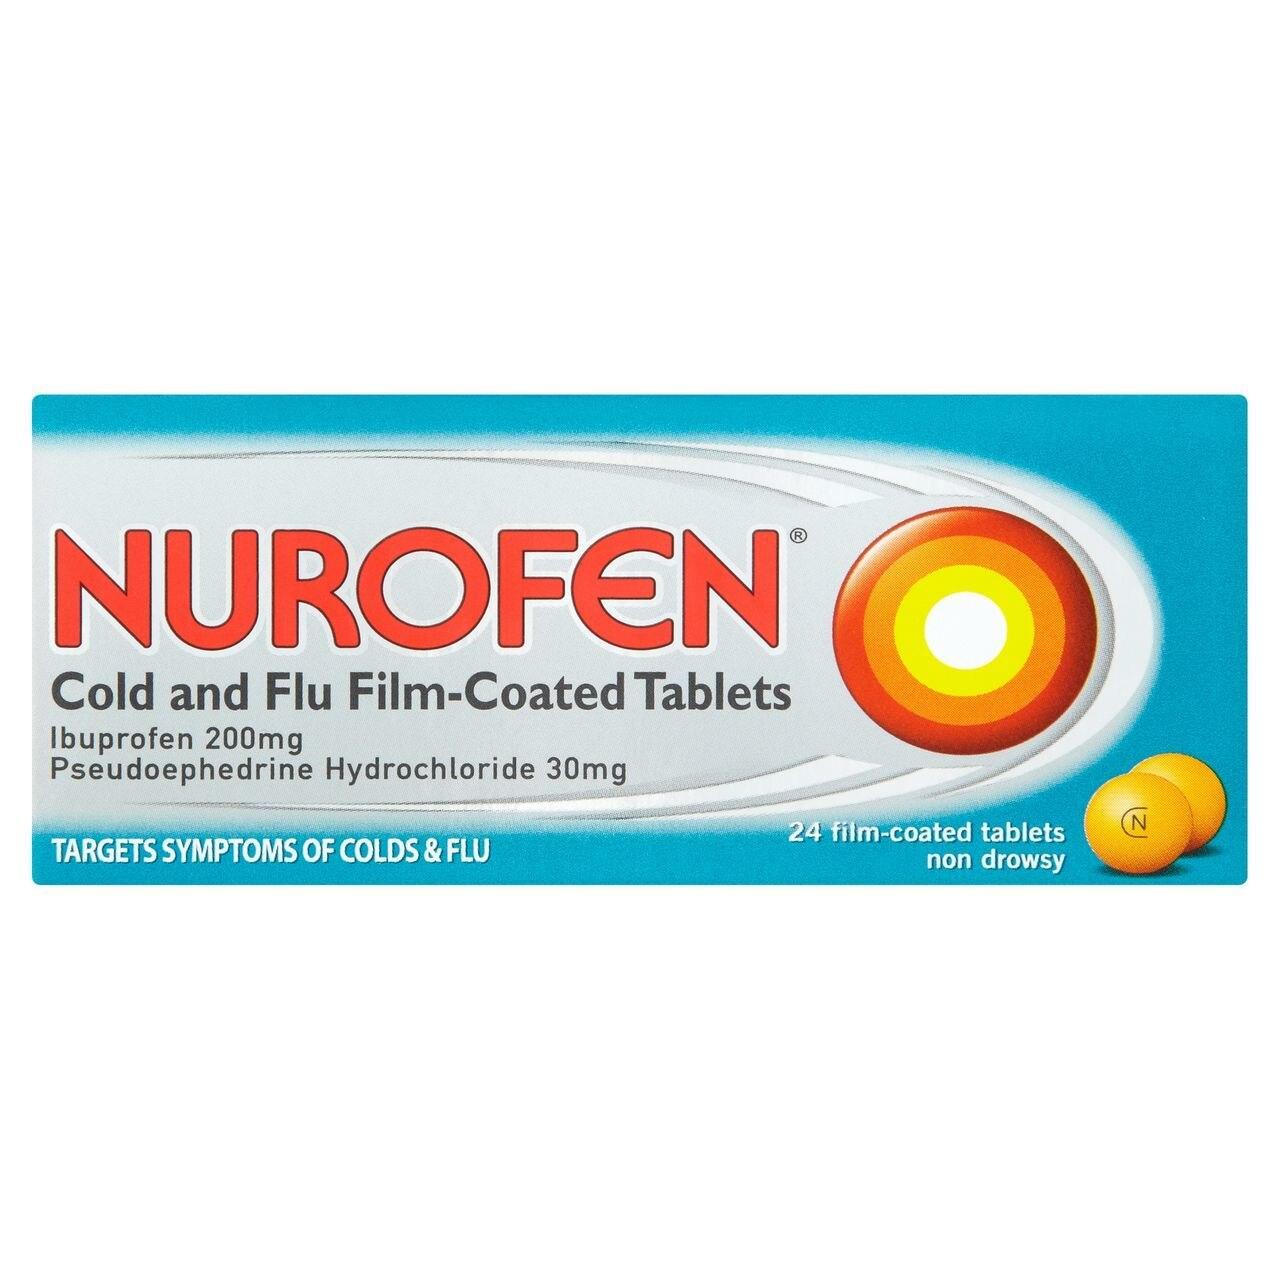 NUROFEN COLD AND FLU TABS